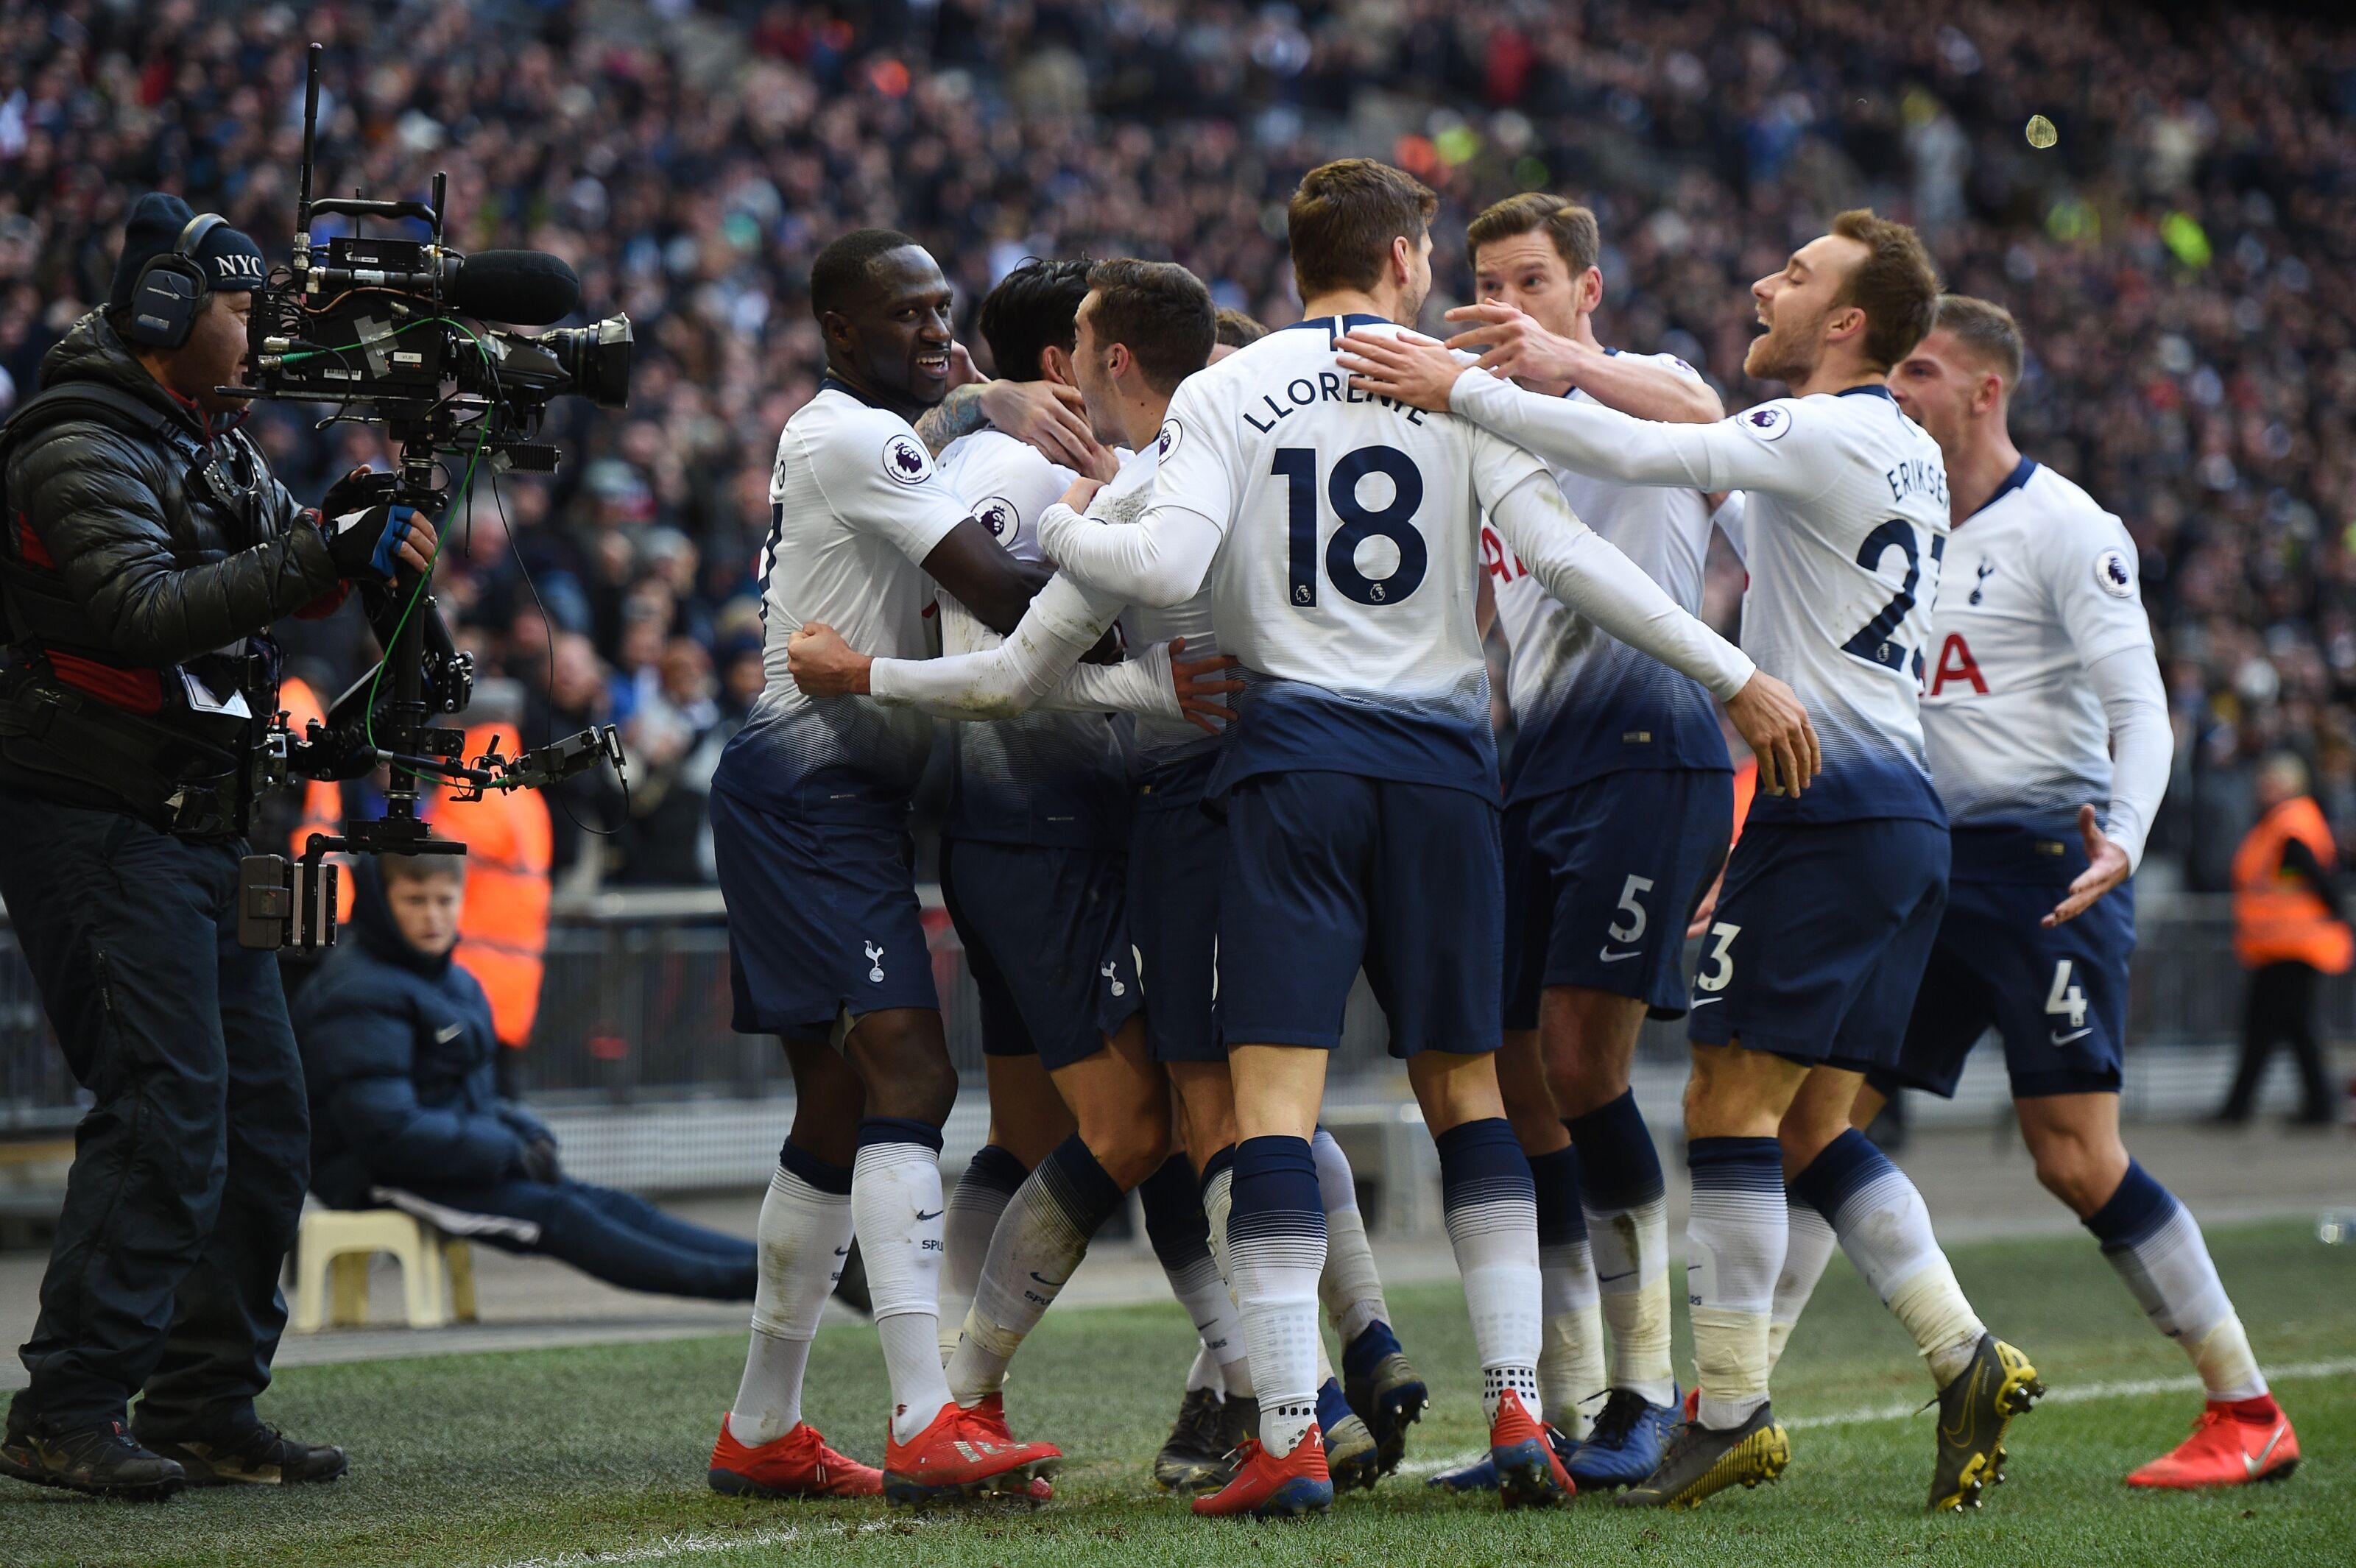 Bvb Vs Tottenham